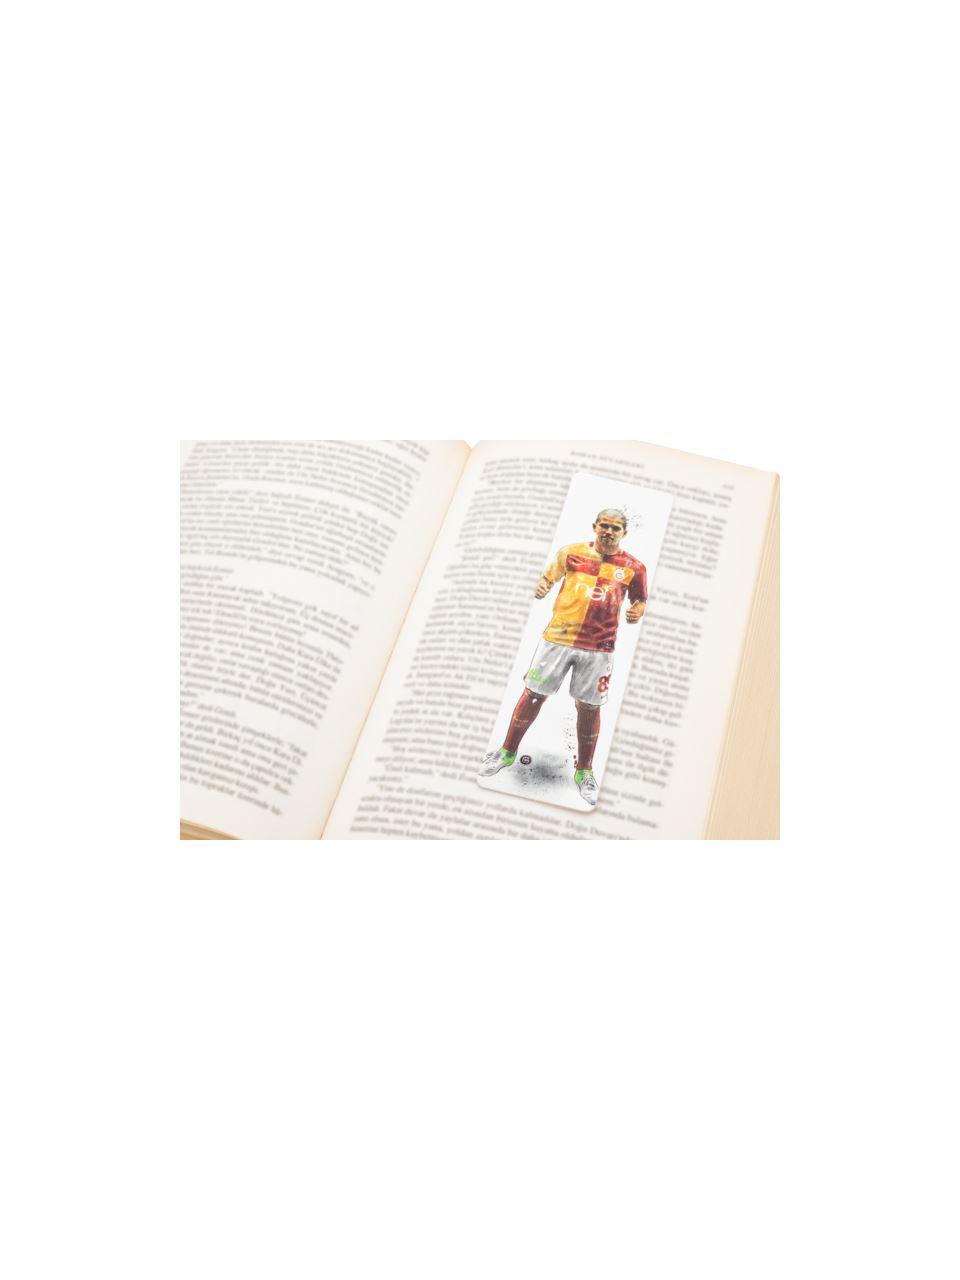 U88124 Feghoulı Standart Kitap Ayracı